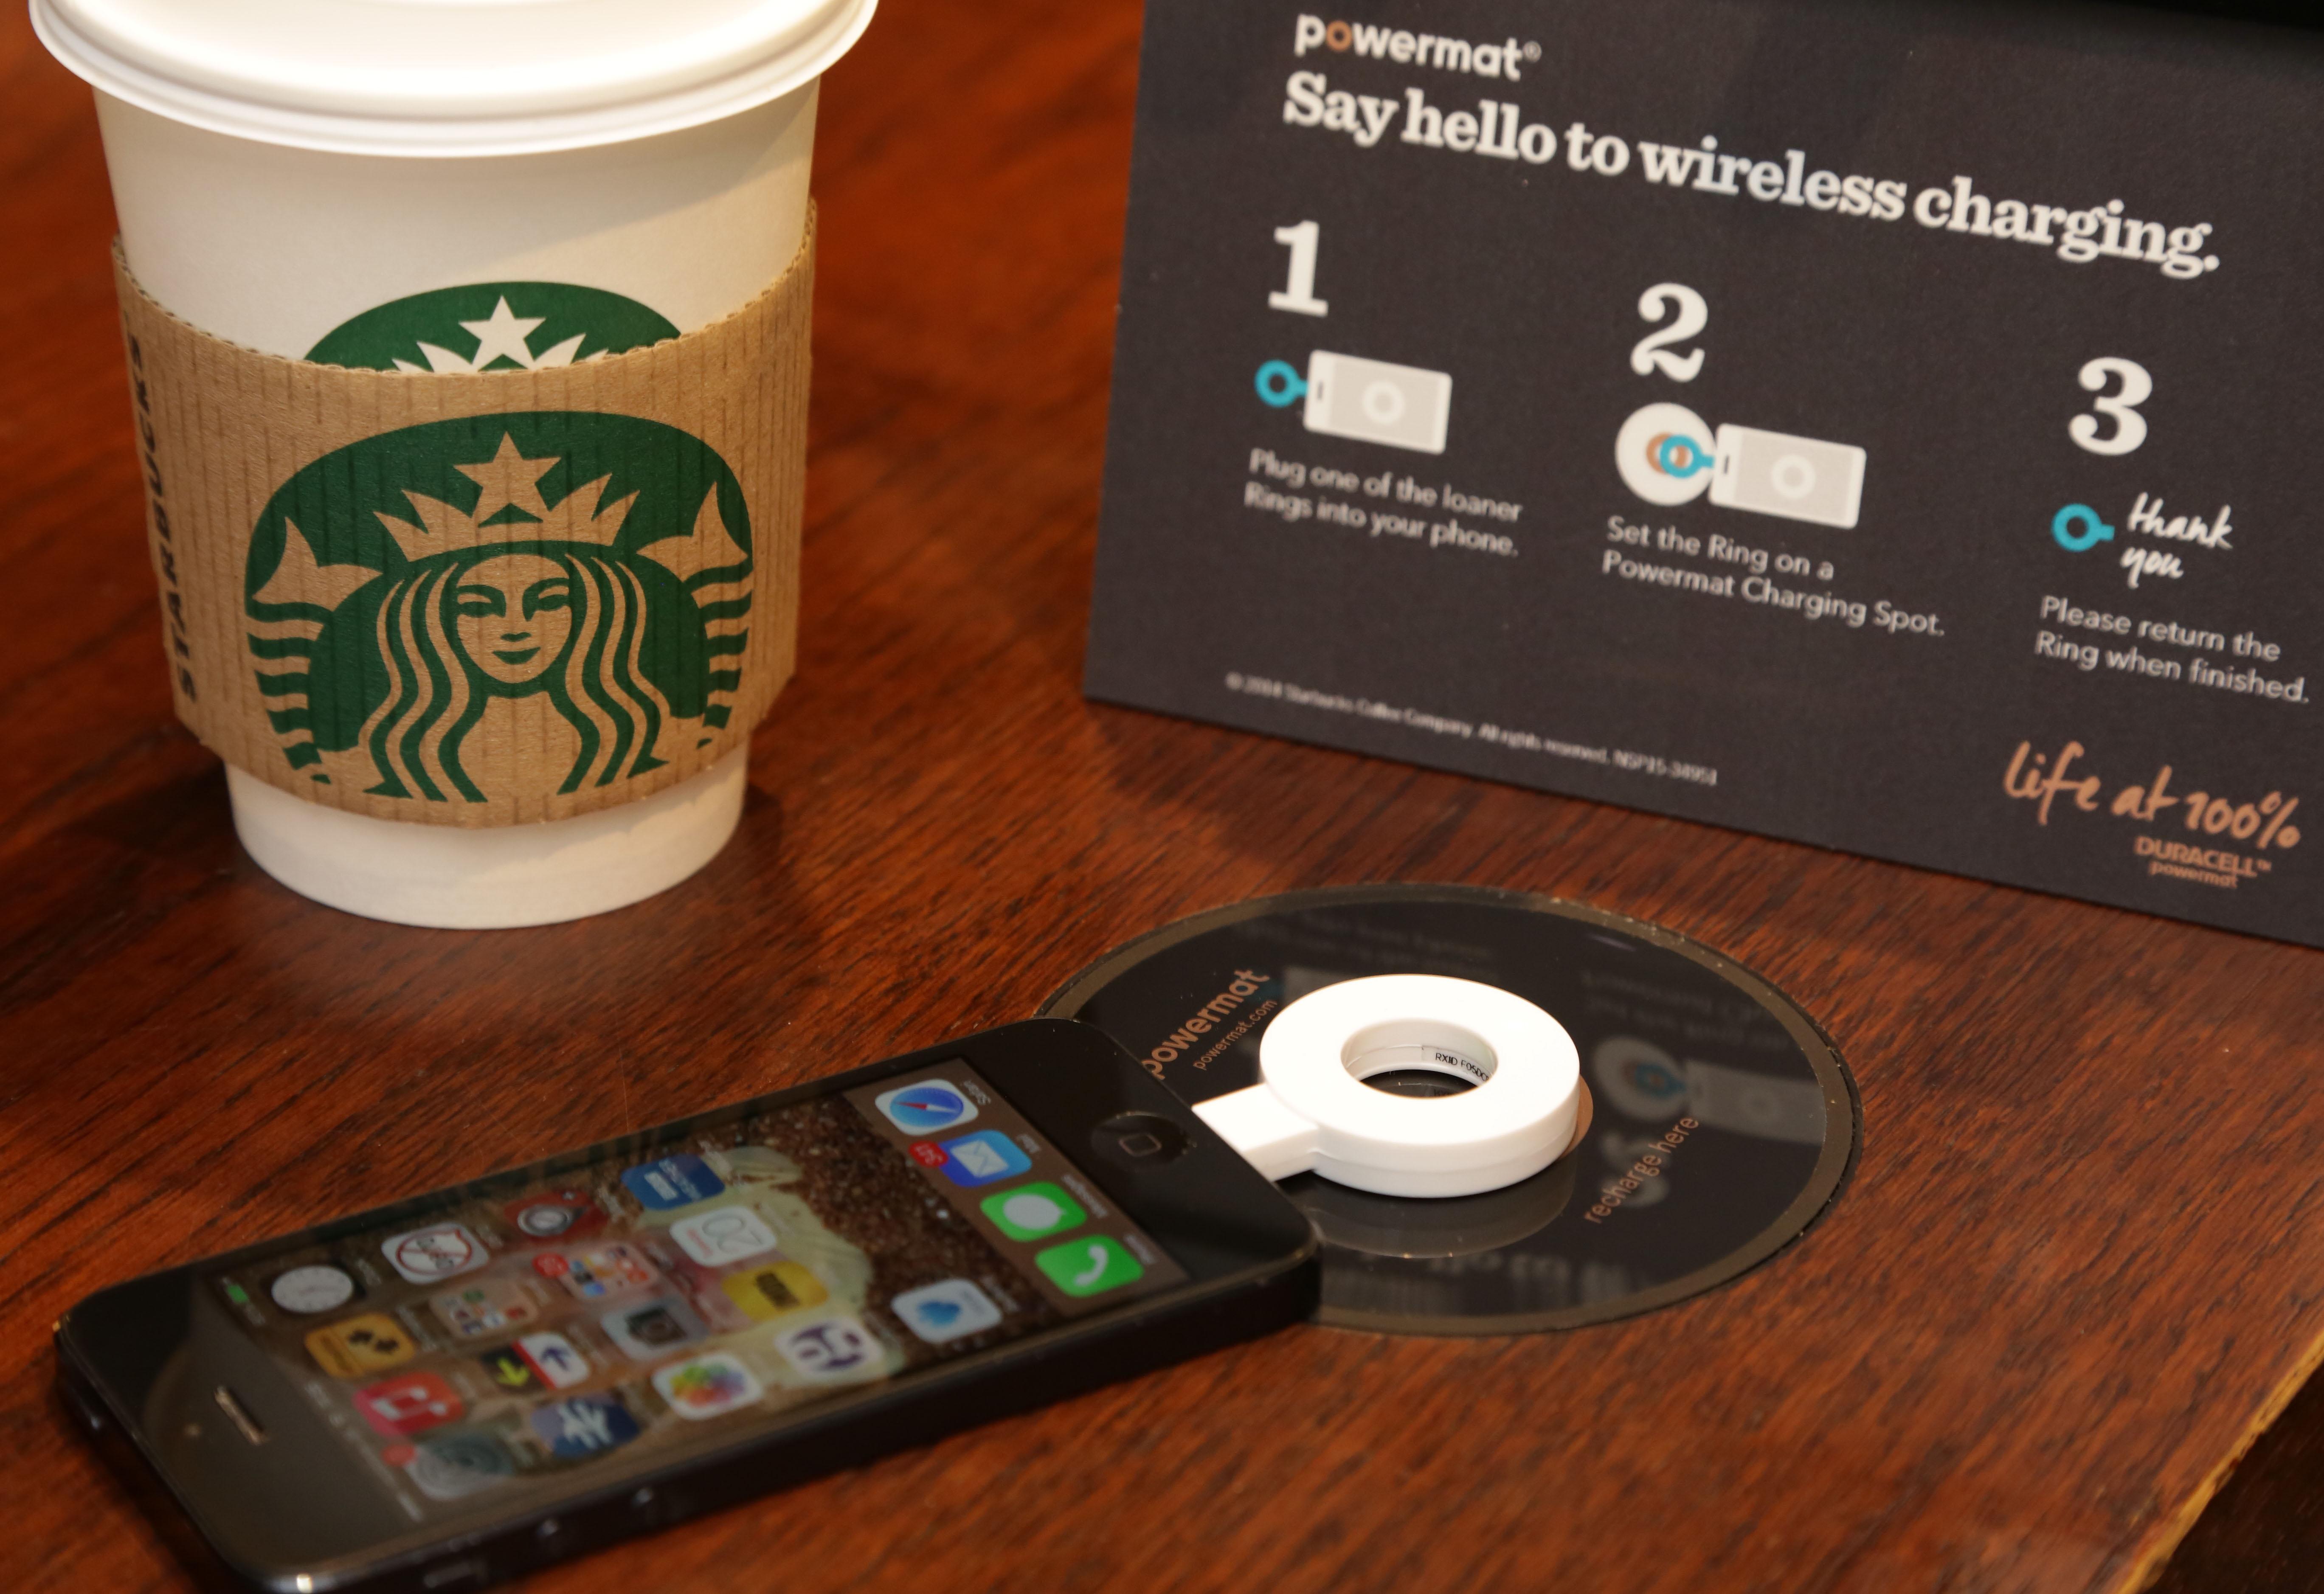 Starbucks Brings Wireless Charging To Uk Stores